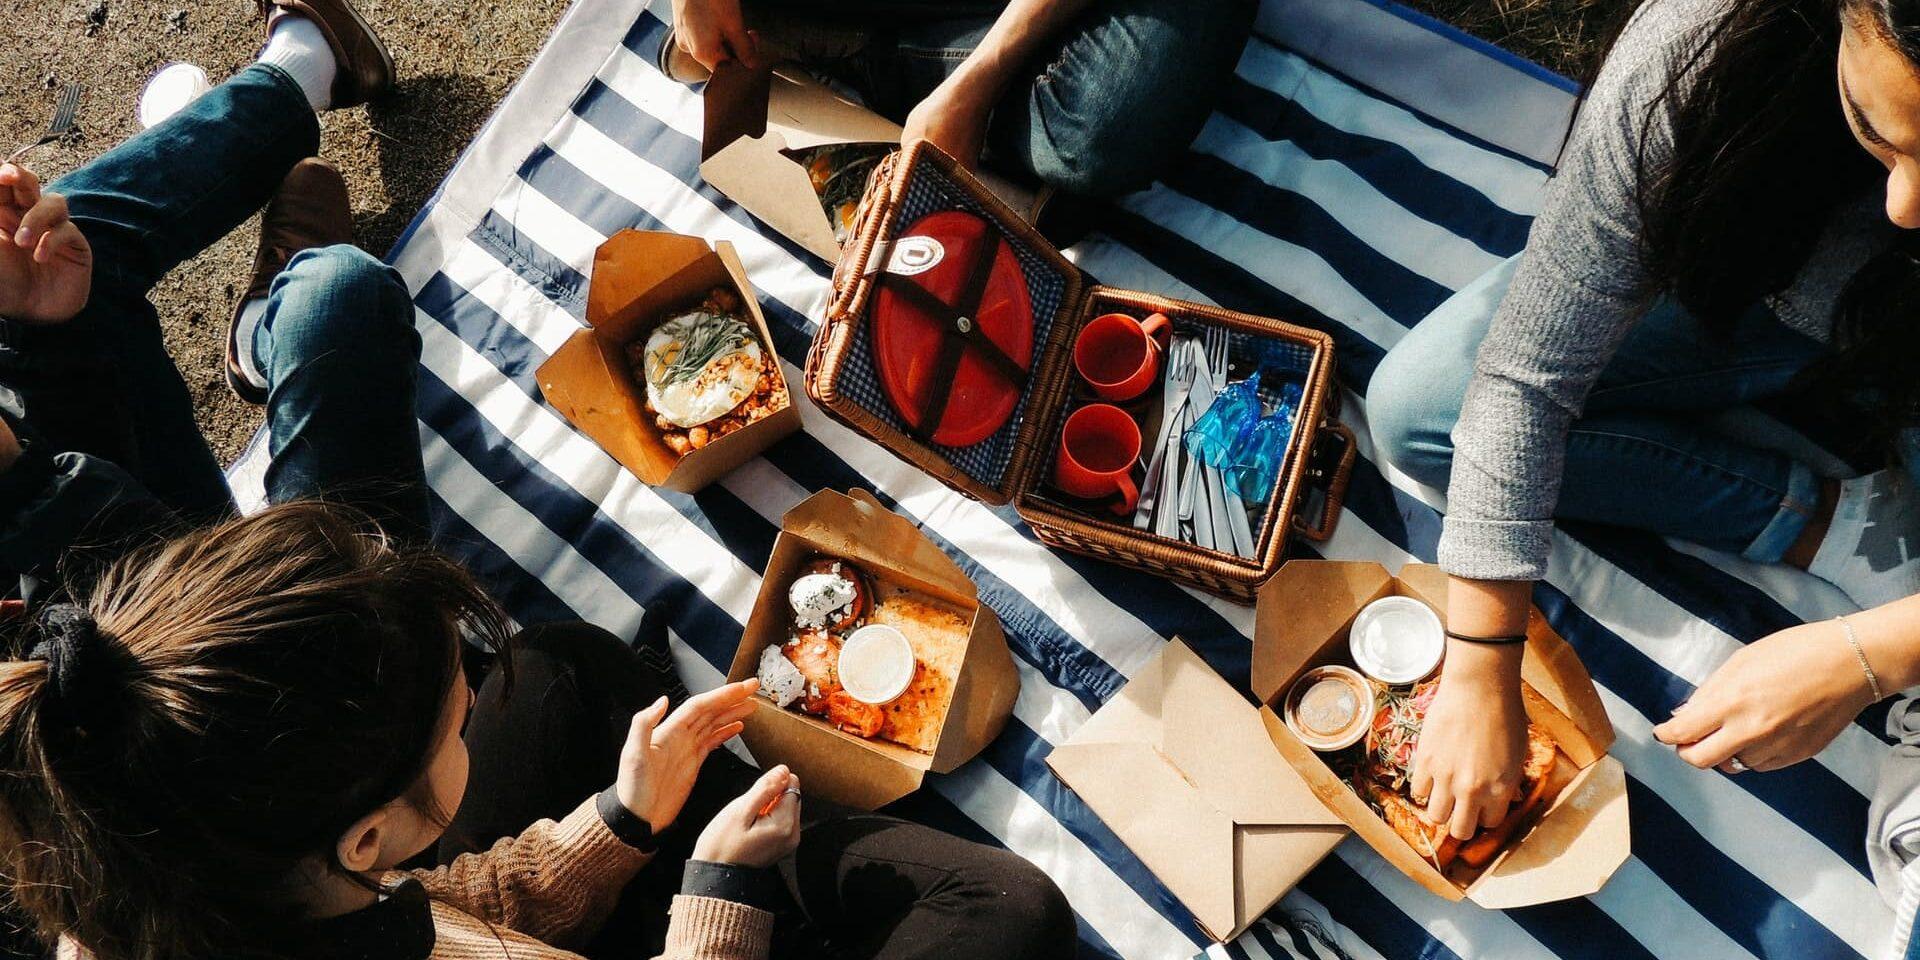 Takeout picnic at Saxe Point by Samantha Fernandes via unsplash.